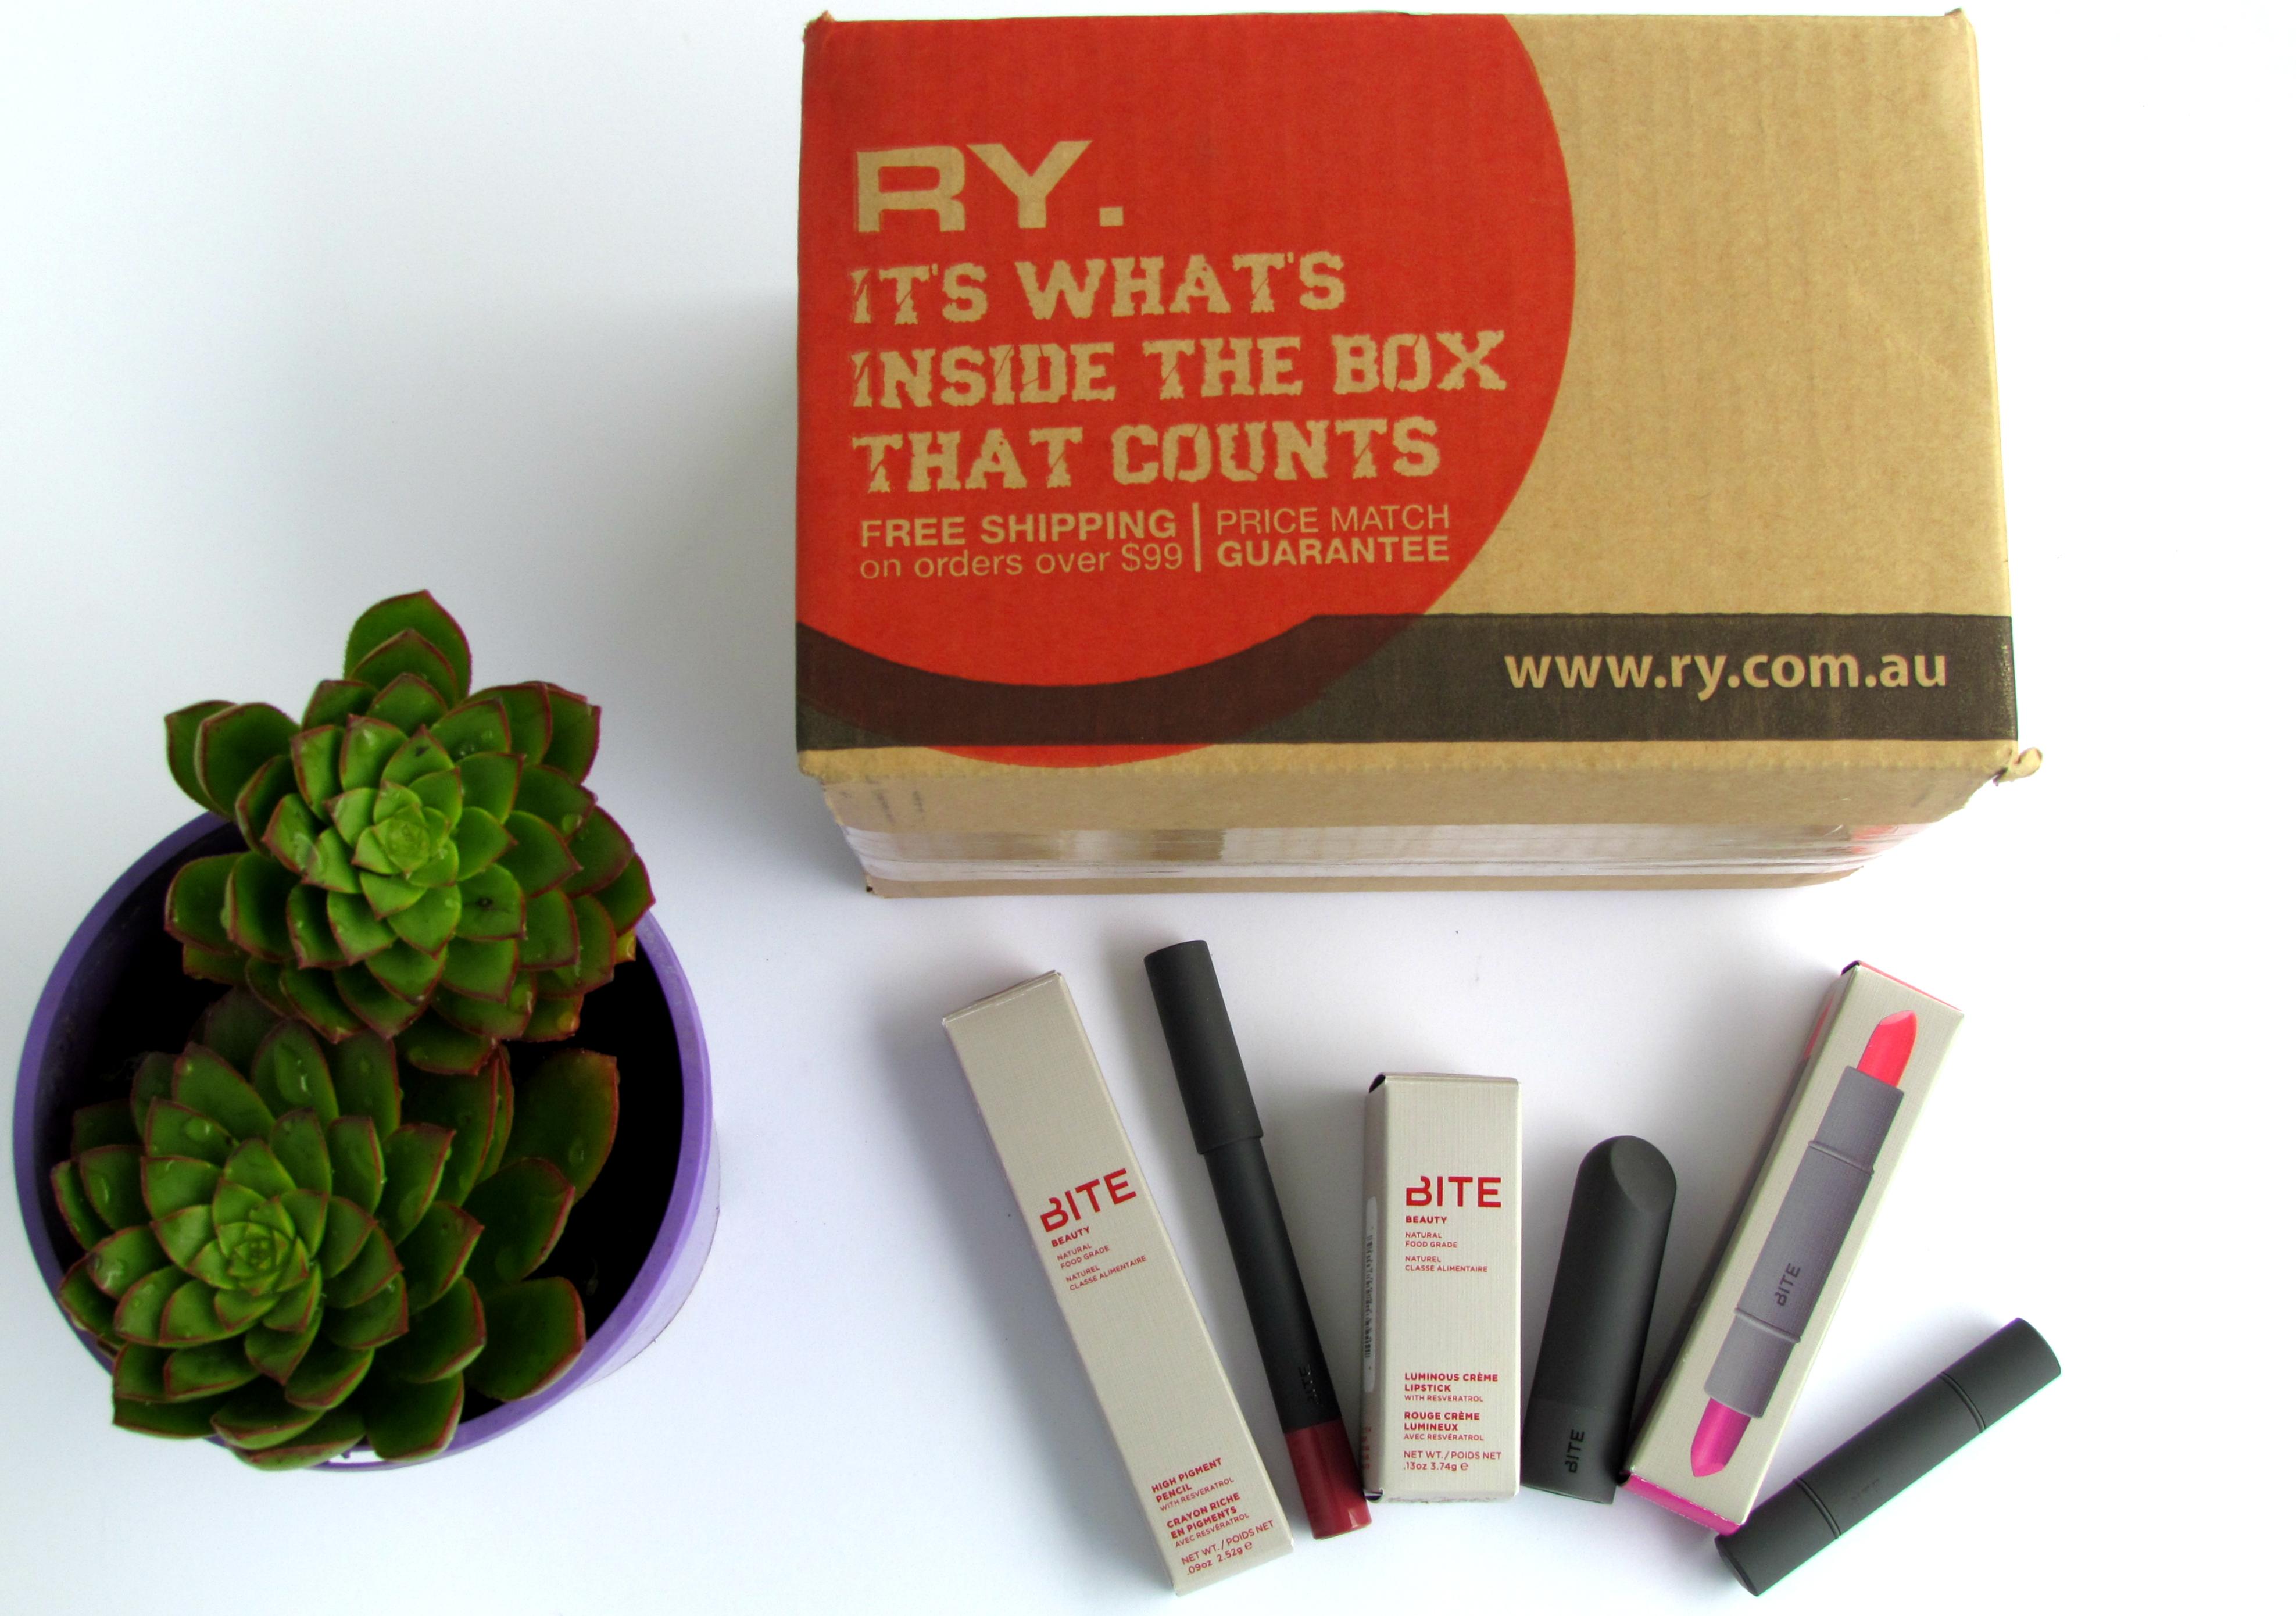 ry.com.au Haul | Website Online Shopping Experience